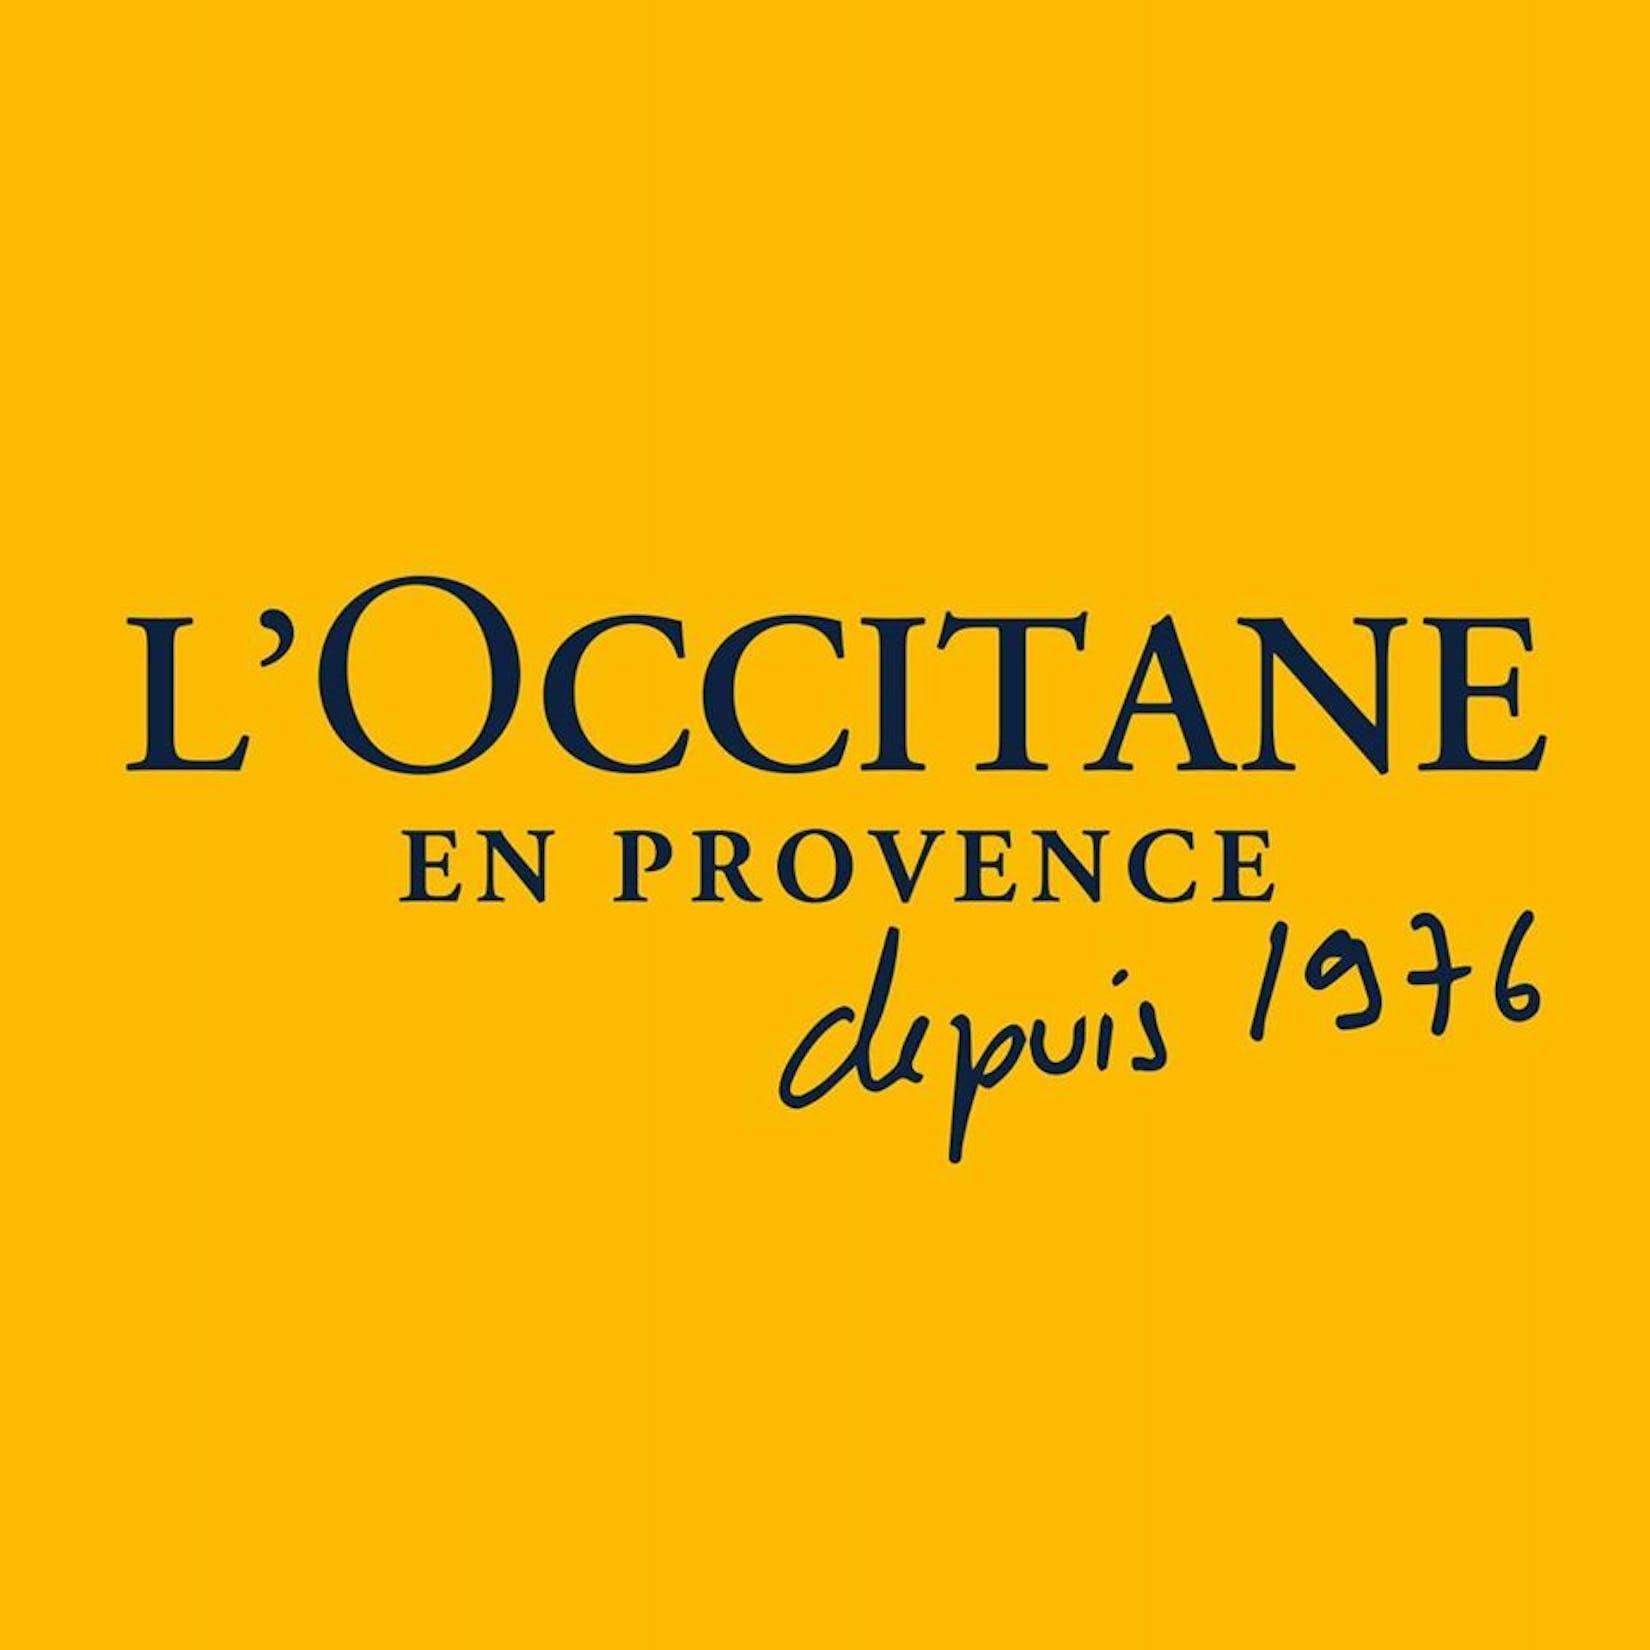 L'OCCITANE en Provence | Beauty